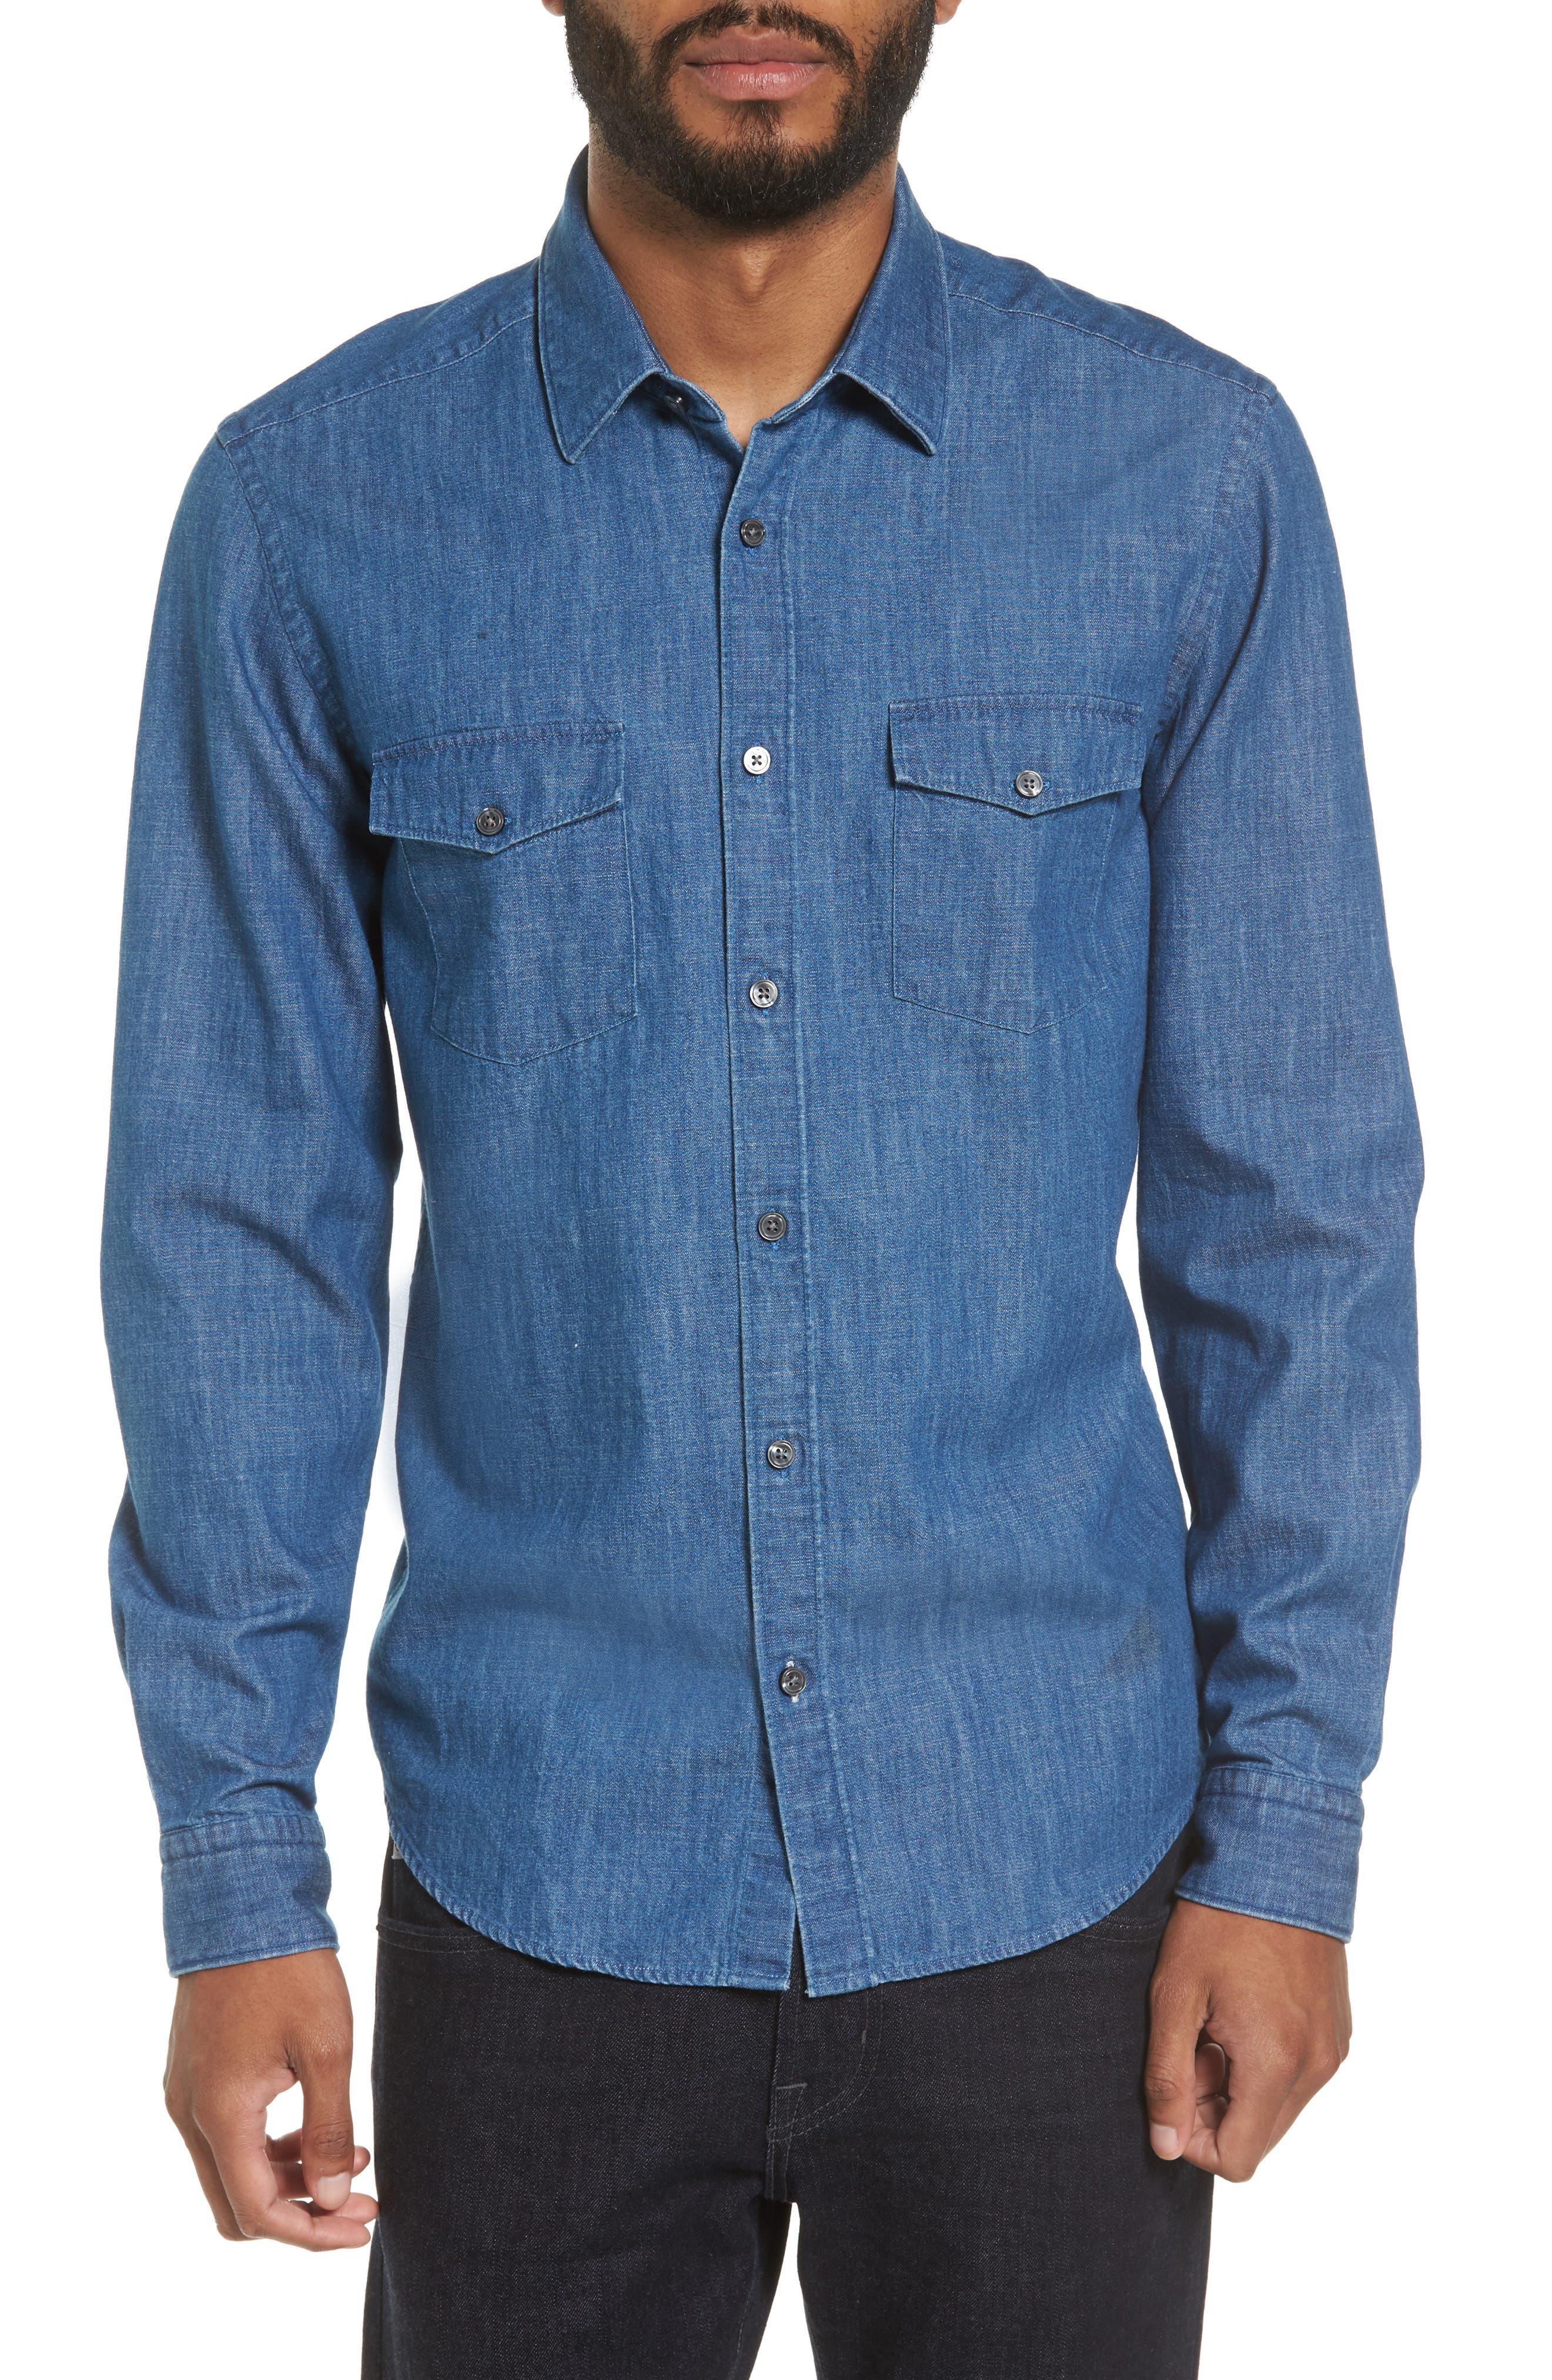 Main Image - BOSS Lance Regular Fit Two-Pocket Denim Sport Shirt